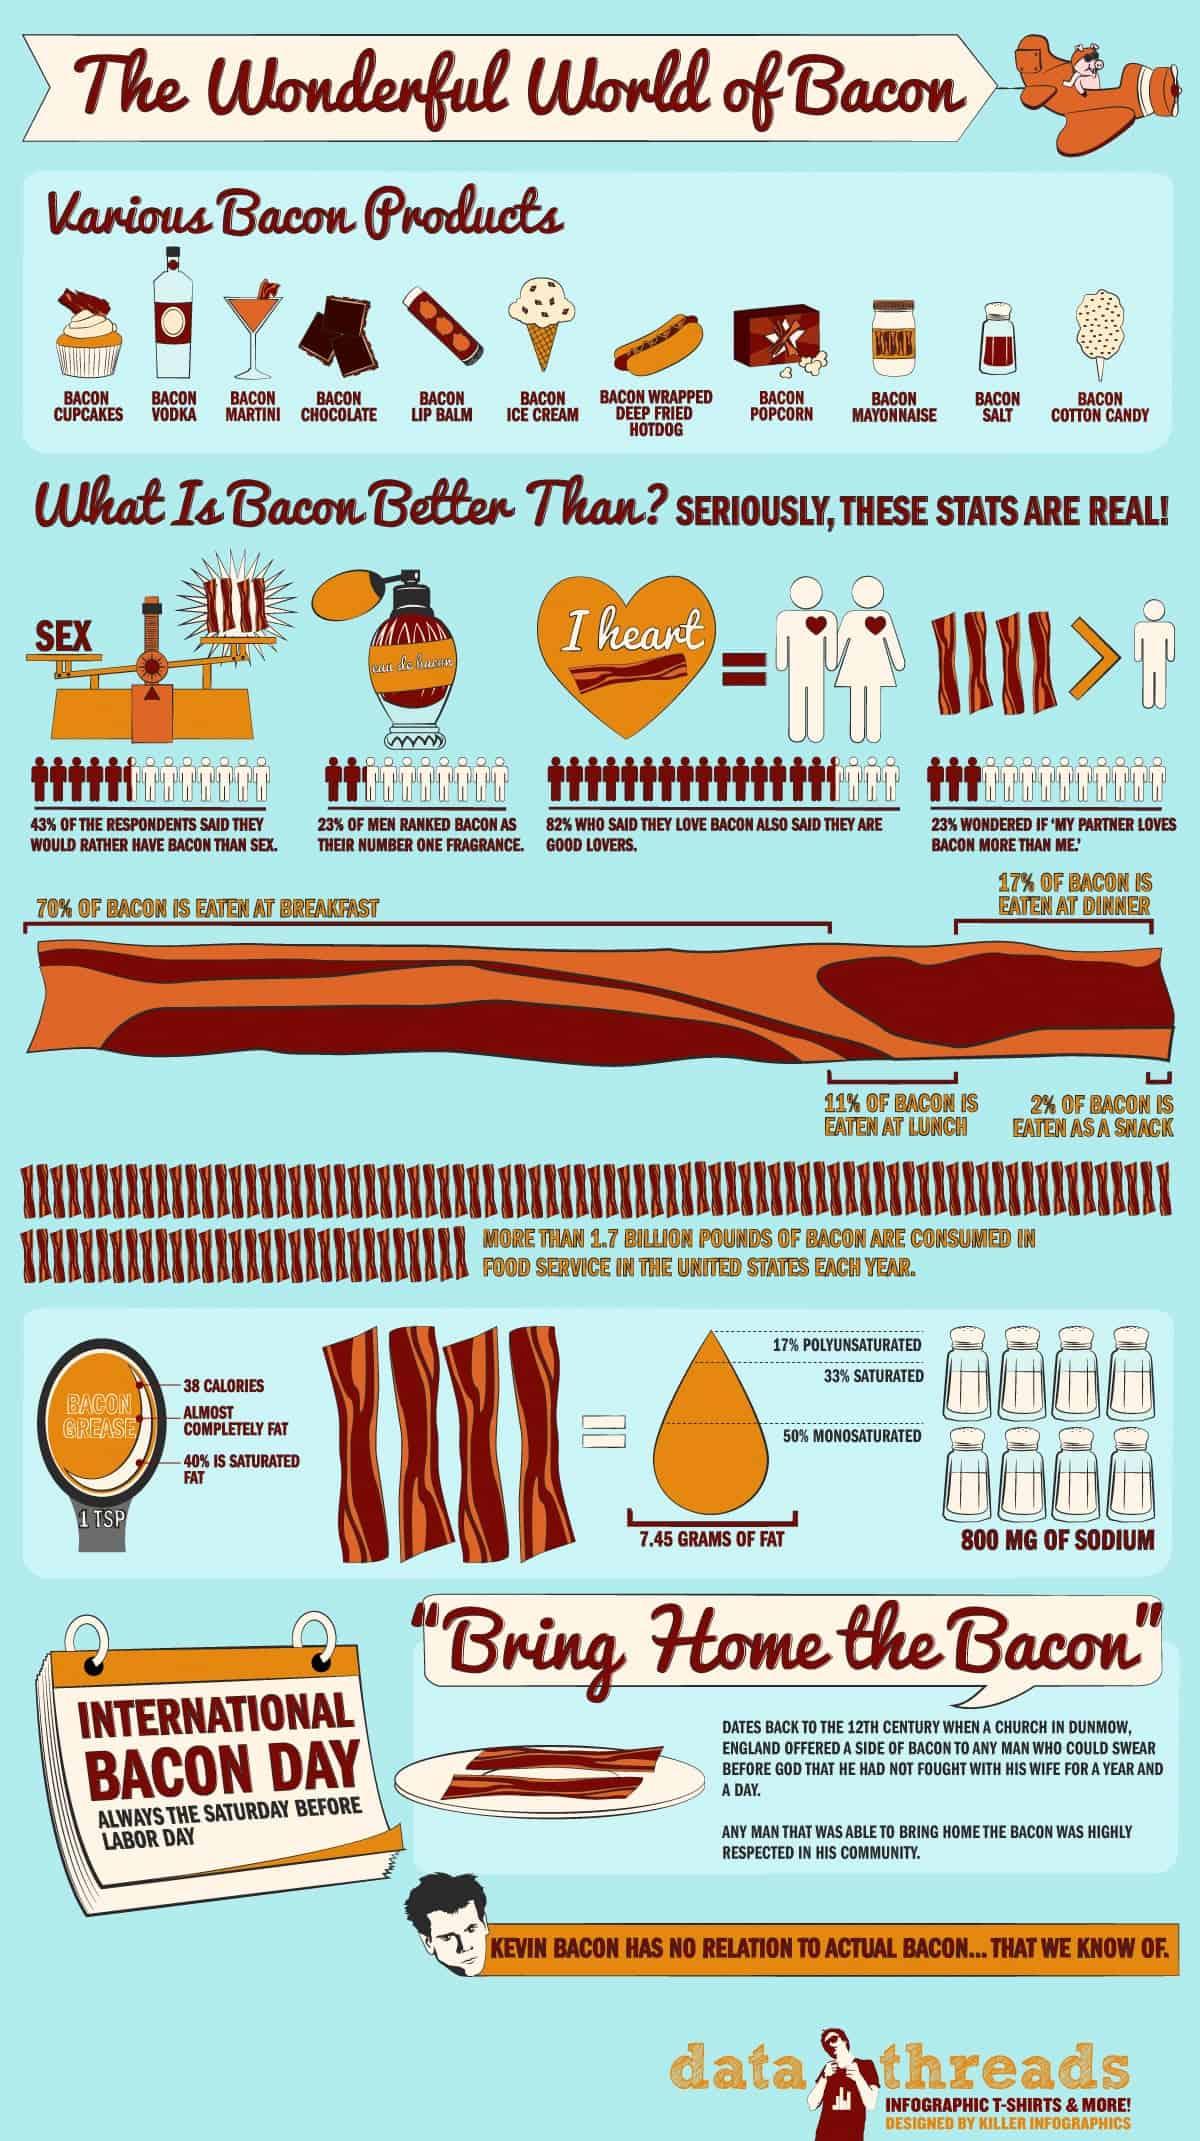 O-Maravilhoso-Mundo-do-Bacon